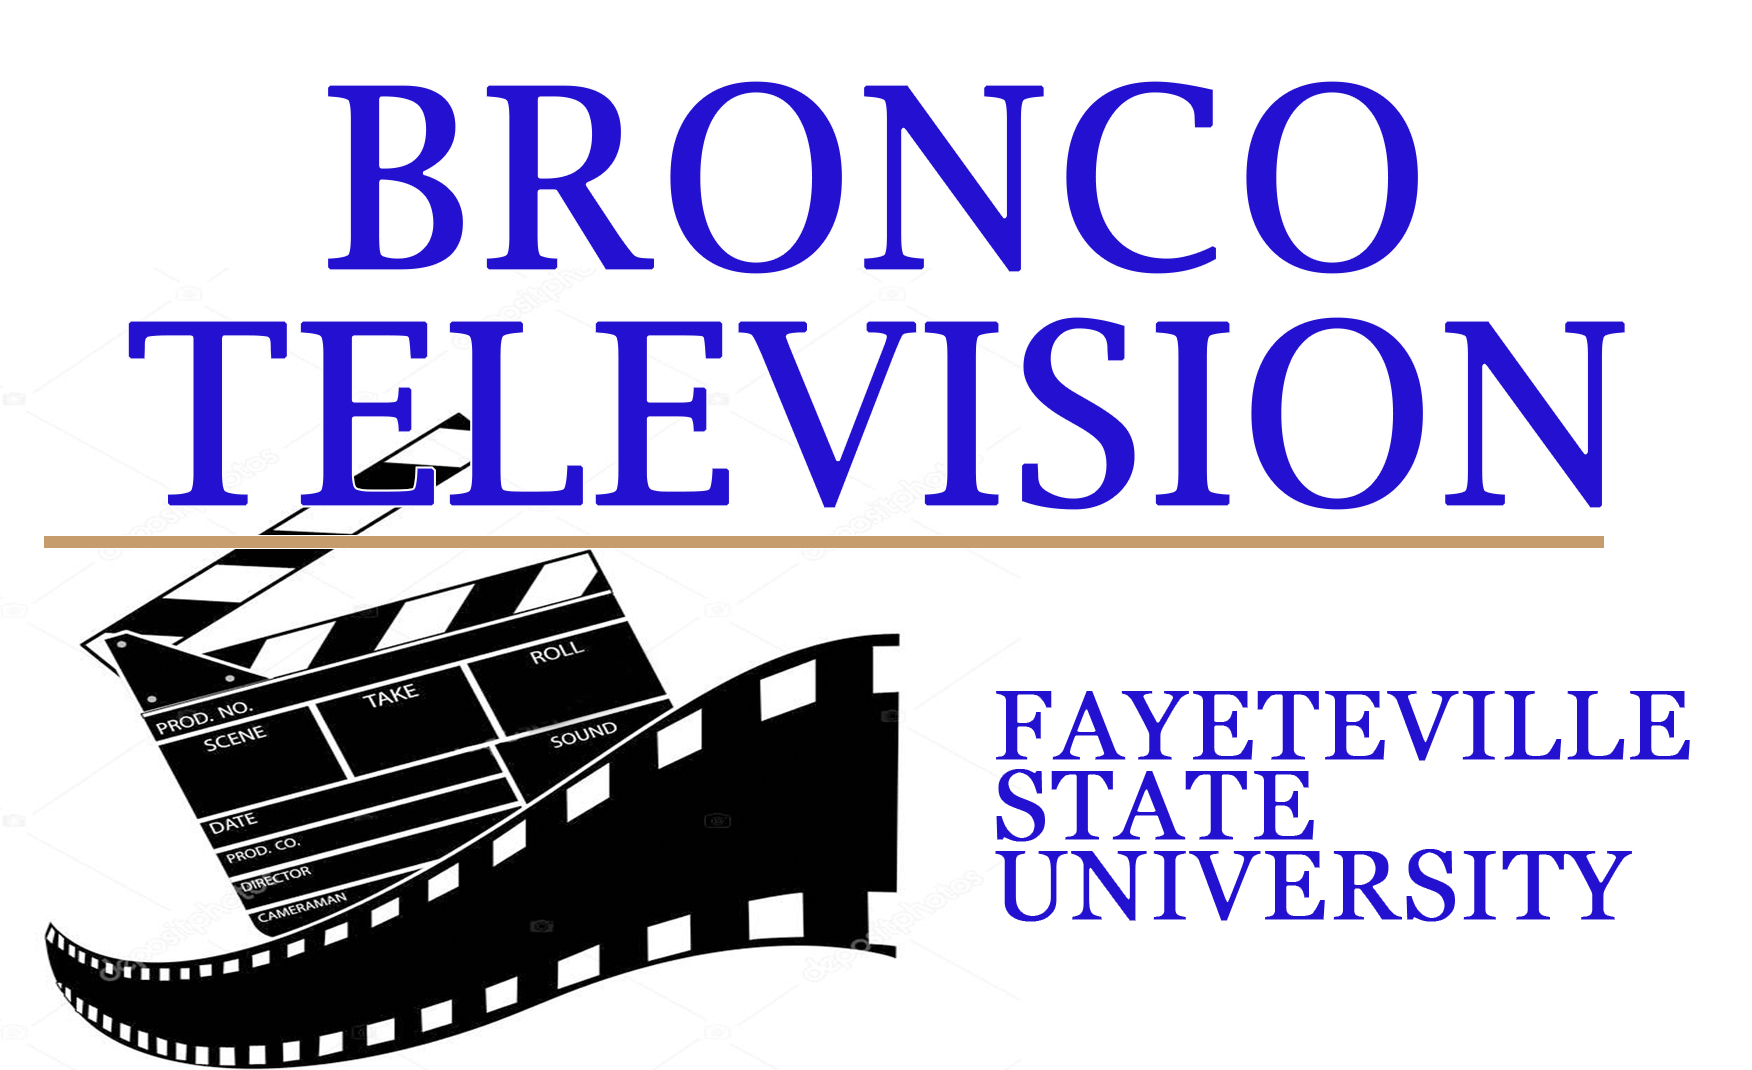 Bronco TV